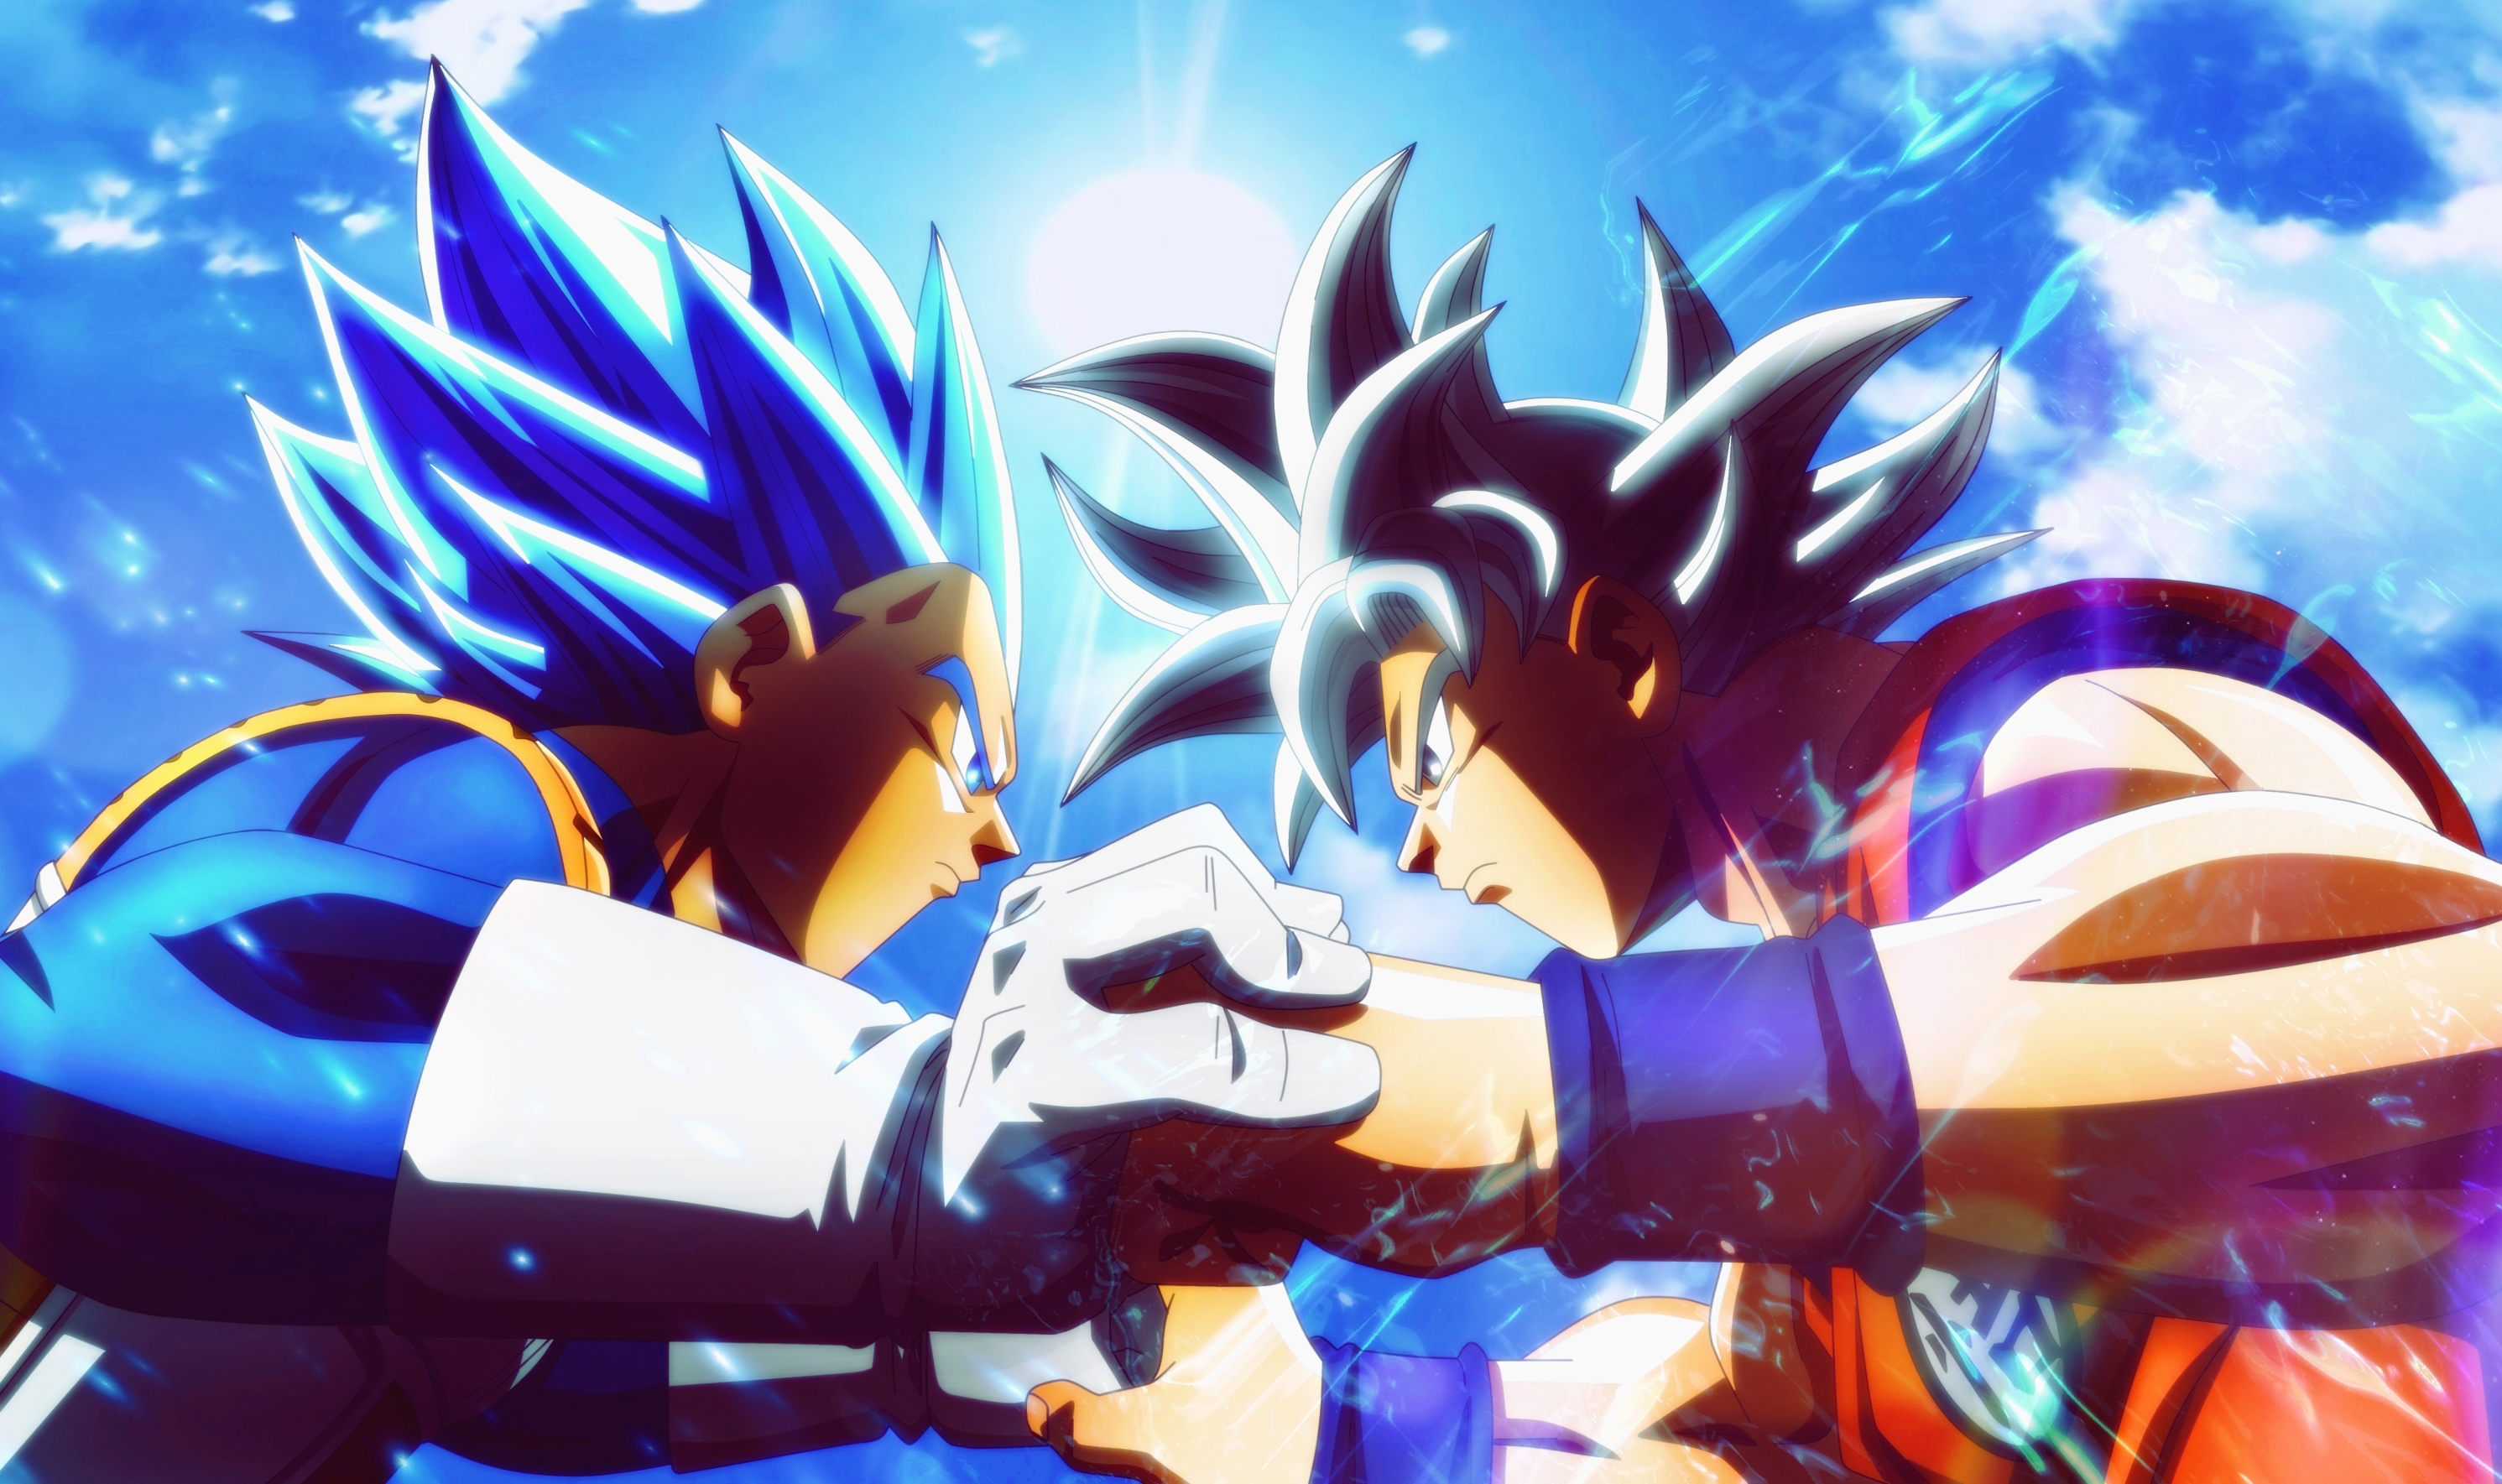 Goku Vs Vegeta, Vegeta Supera a Goku,Estatuani